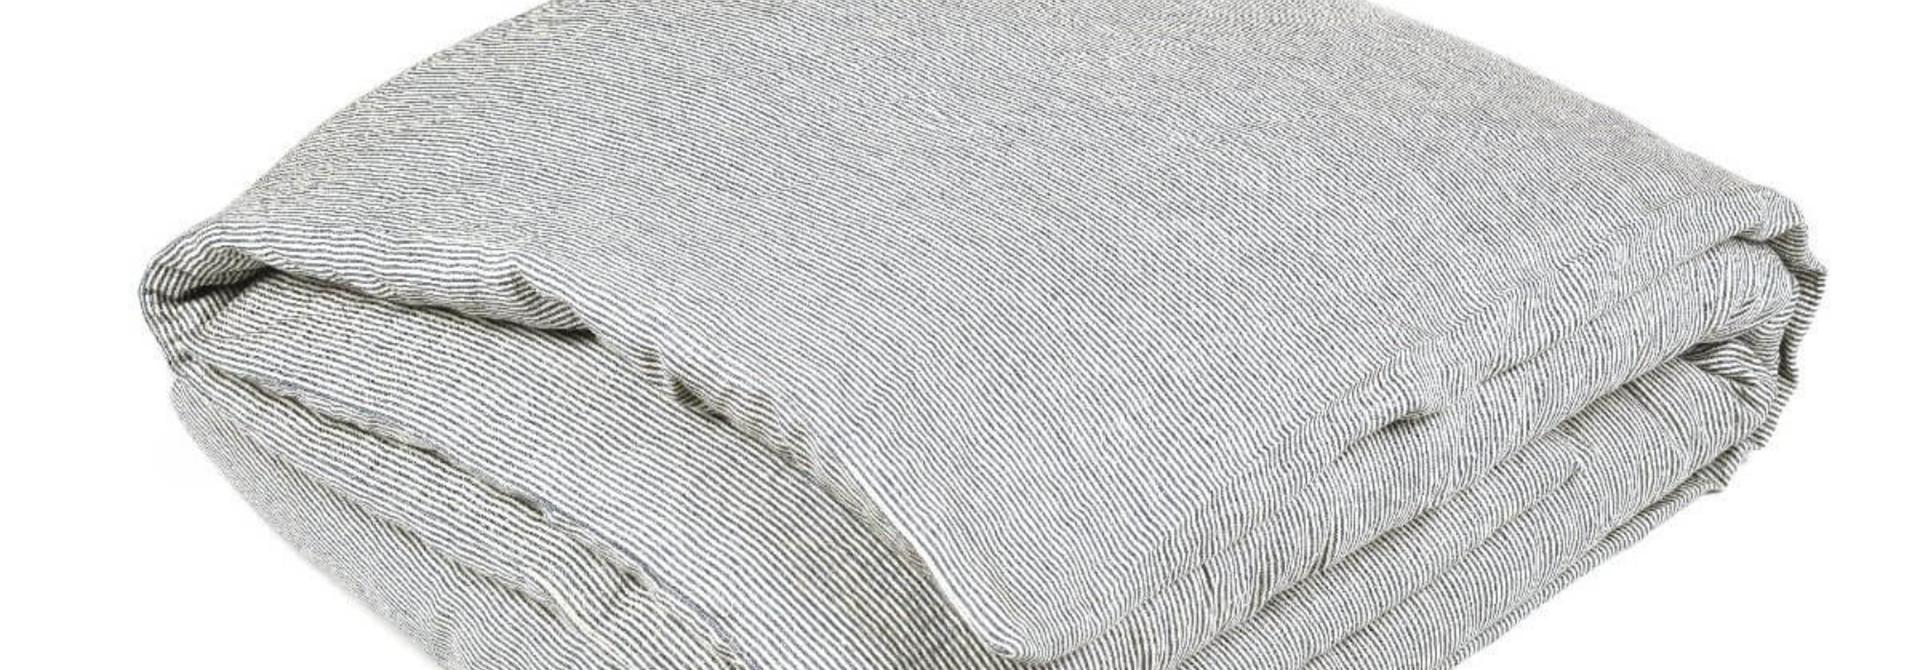 Duvet Cover -  The Workshop Stripe